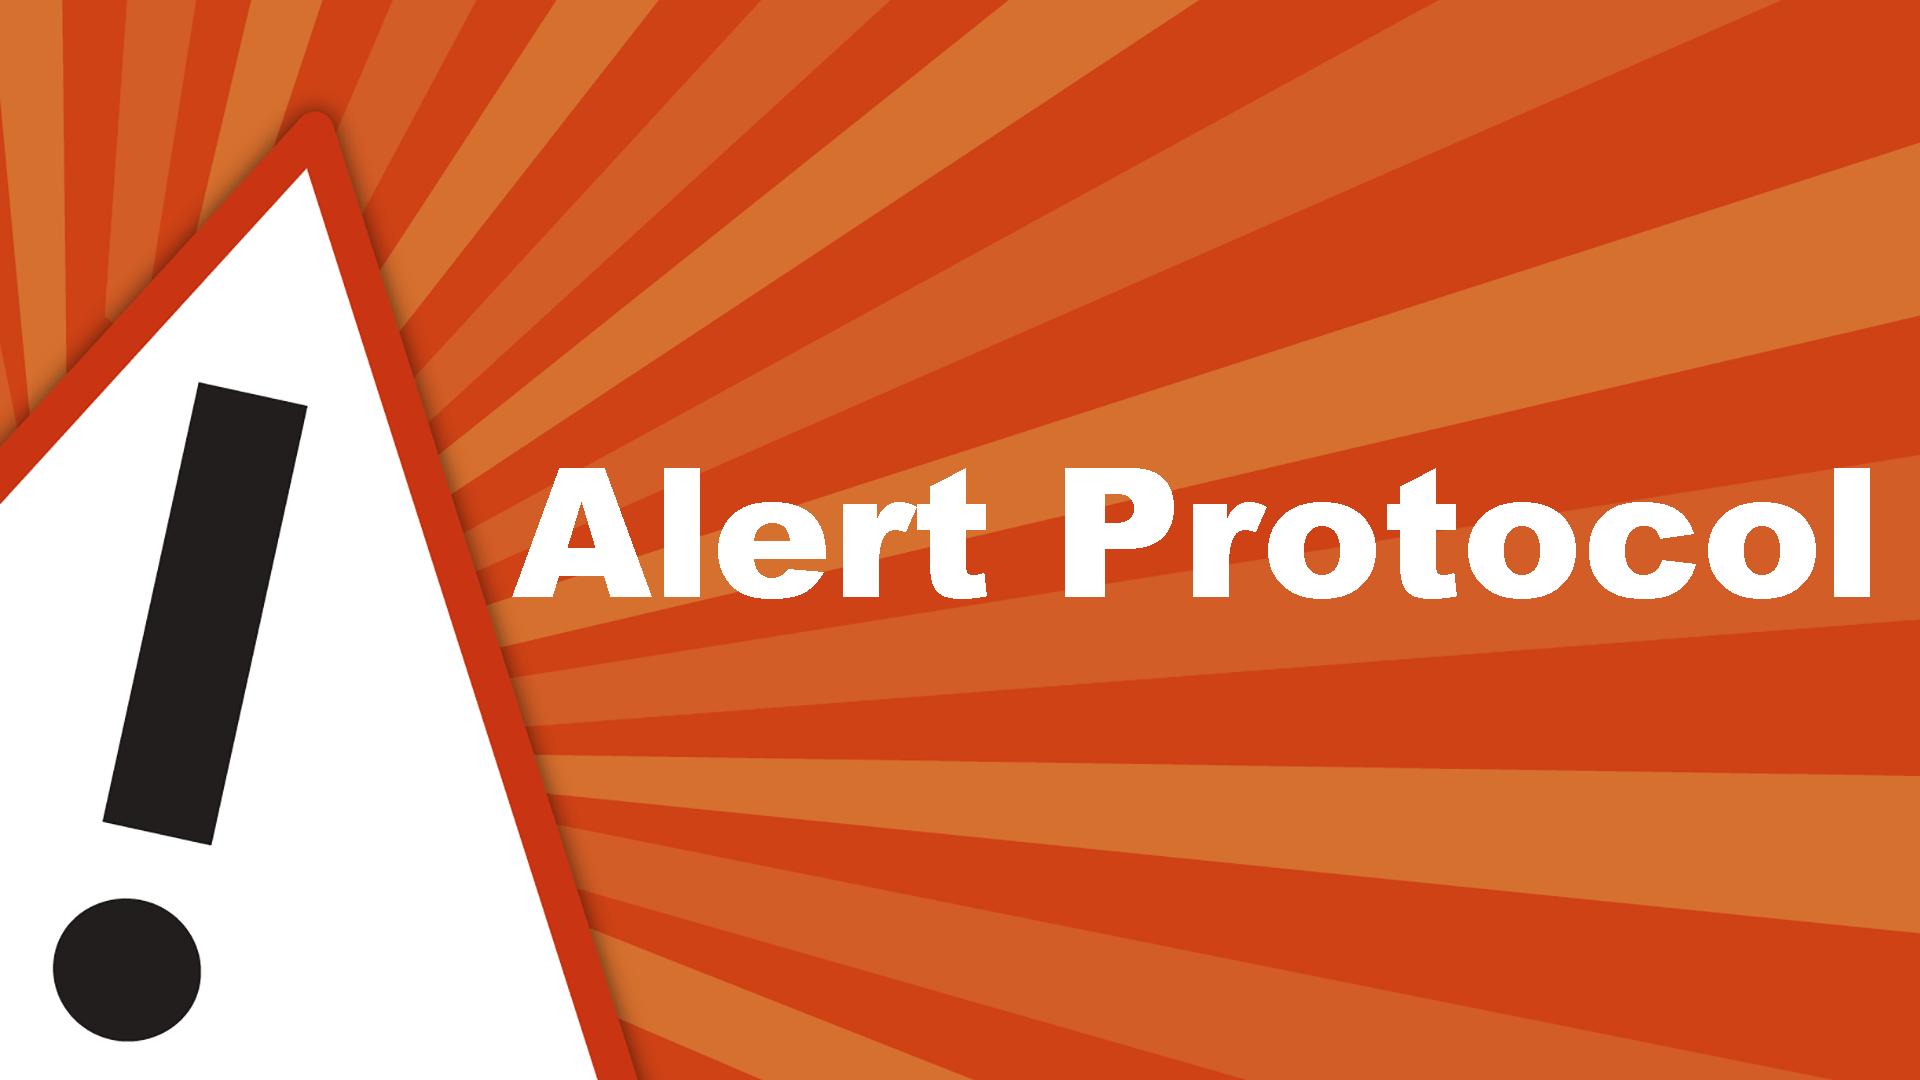 TLS 1.3 Alert Protocol